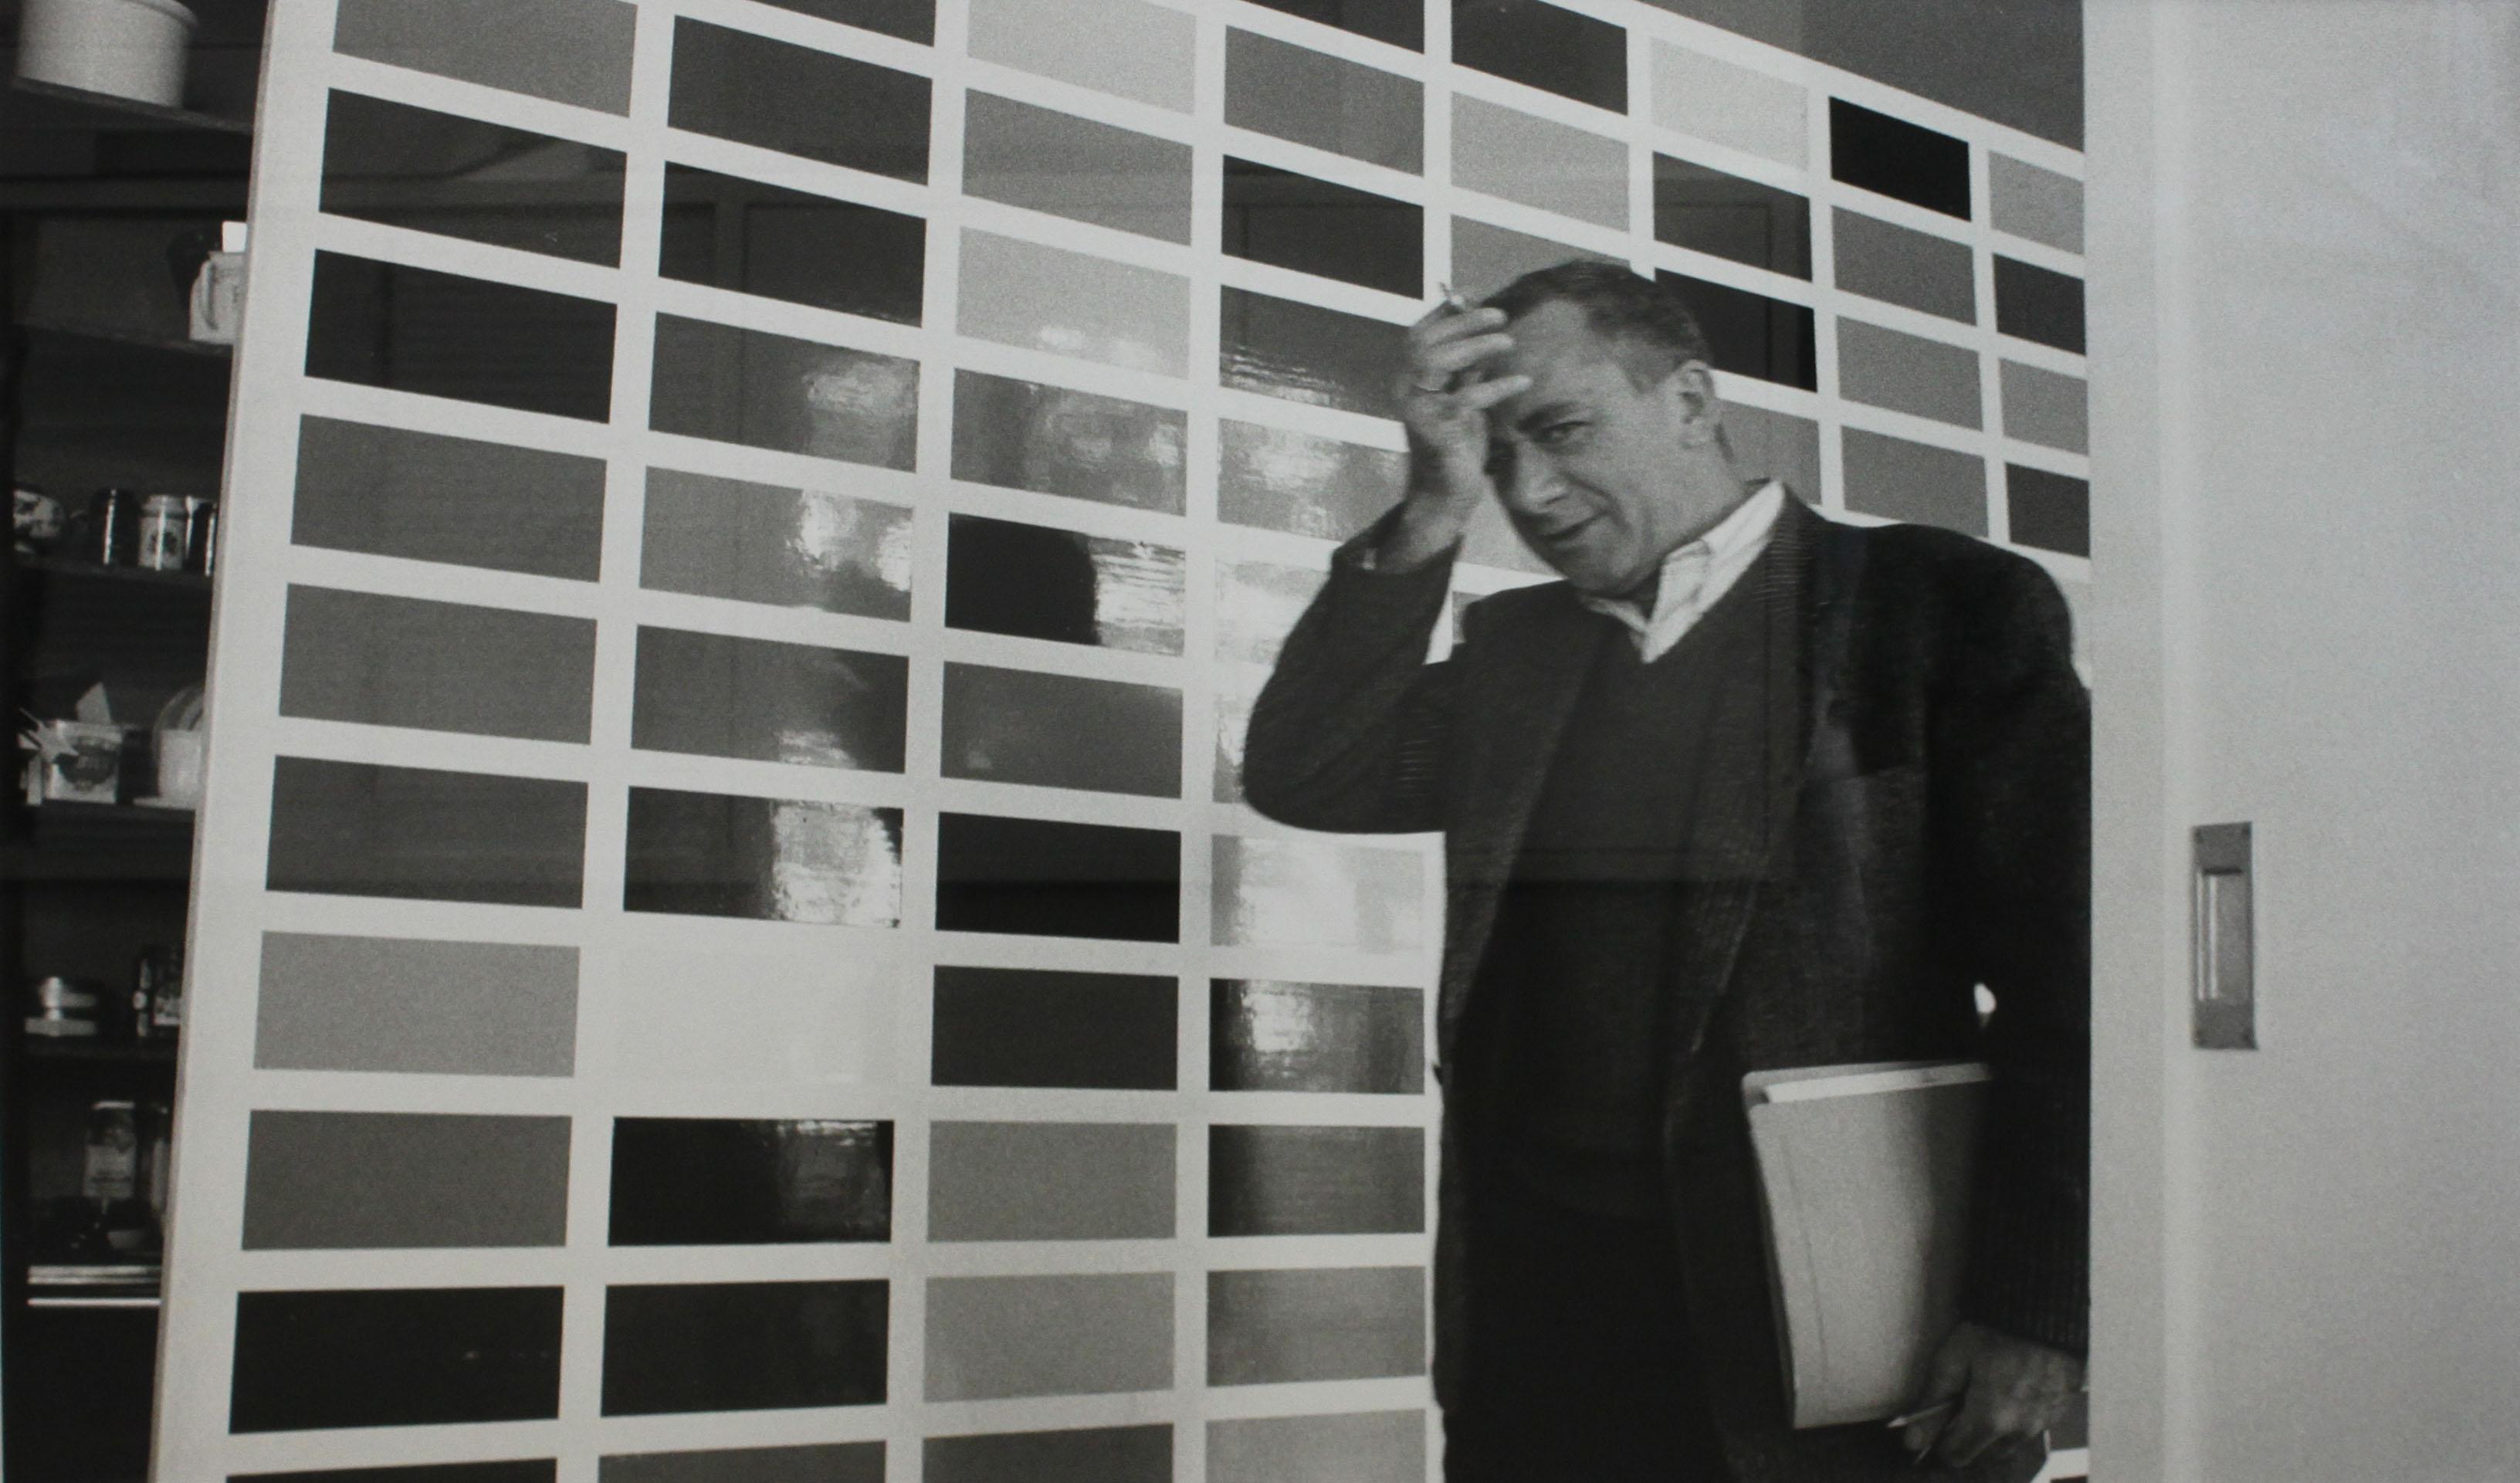 Gerhard Richter im Kölner Atelier, 1991. Foto: Benjamin Katz. Copyright VG Bild-Kunst Bonn 2017.